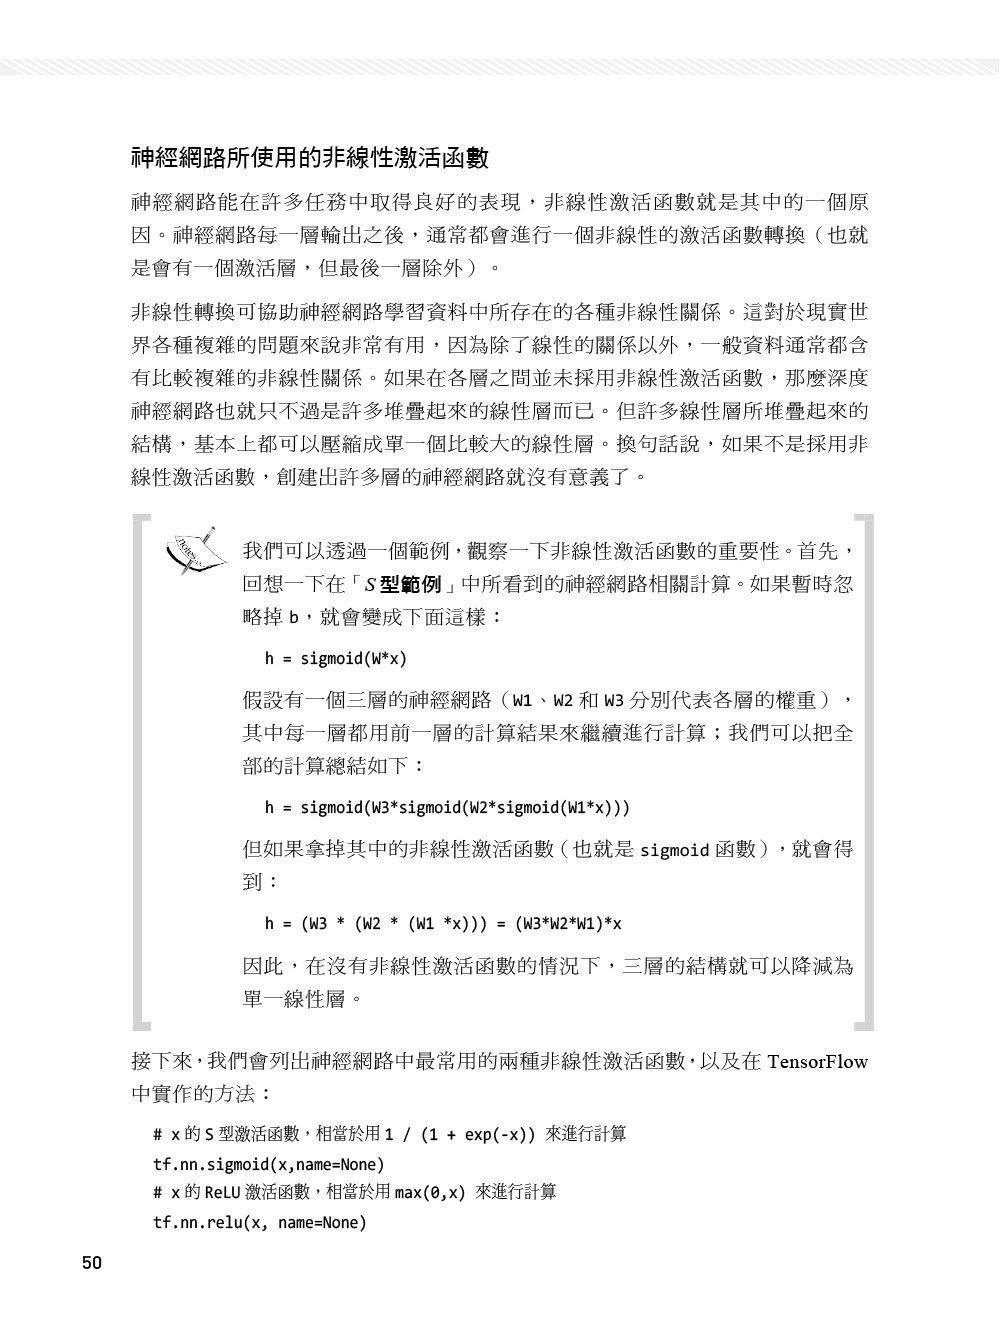 TensorFlow 自然語言處理|善用 Python 深度學習函式庫,教機器學會自然語言 (Natural Language Processing with TensorFlow)-preview-6